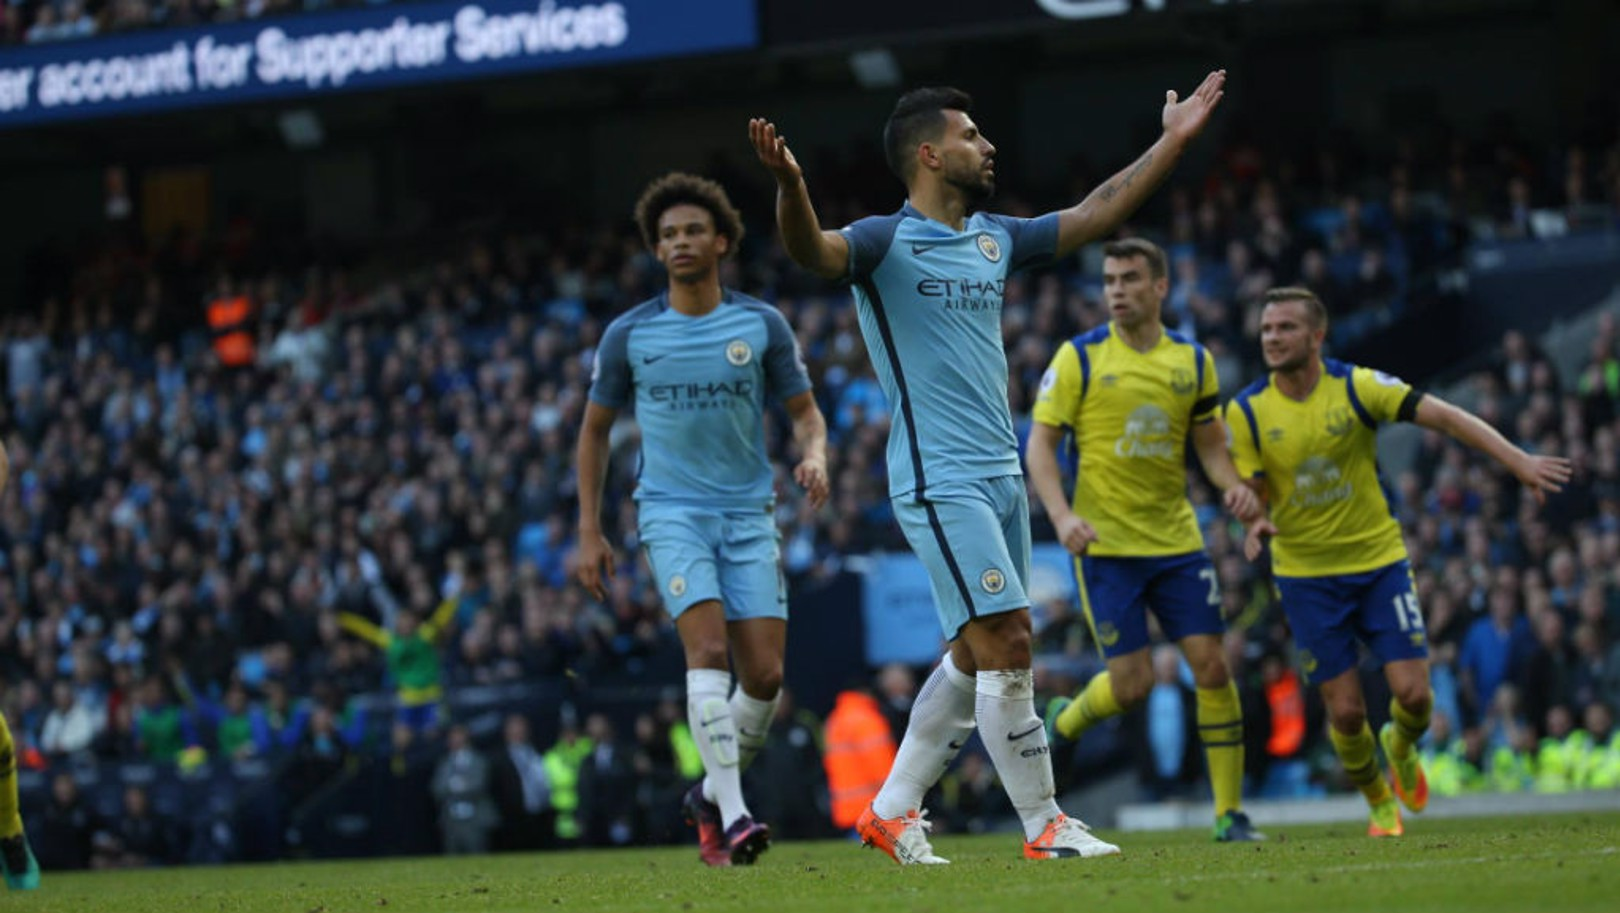 NOT AGAIN! Sergio Aguero sees his spot-kick saved